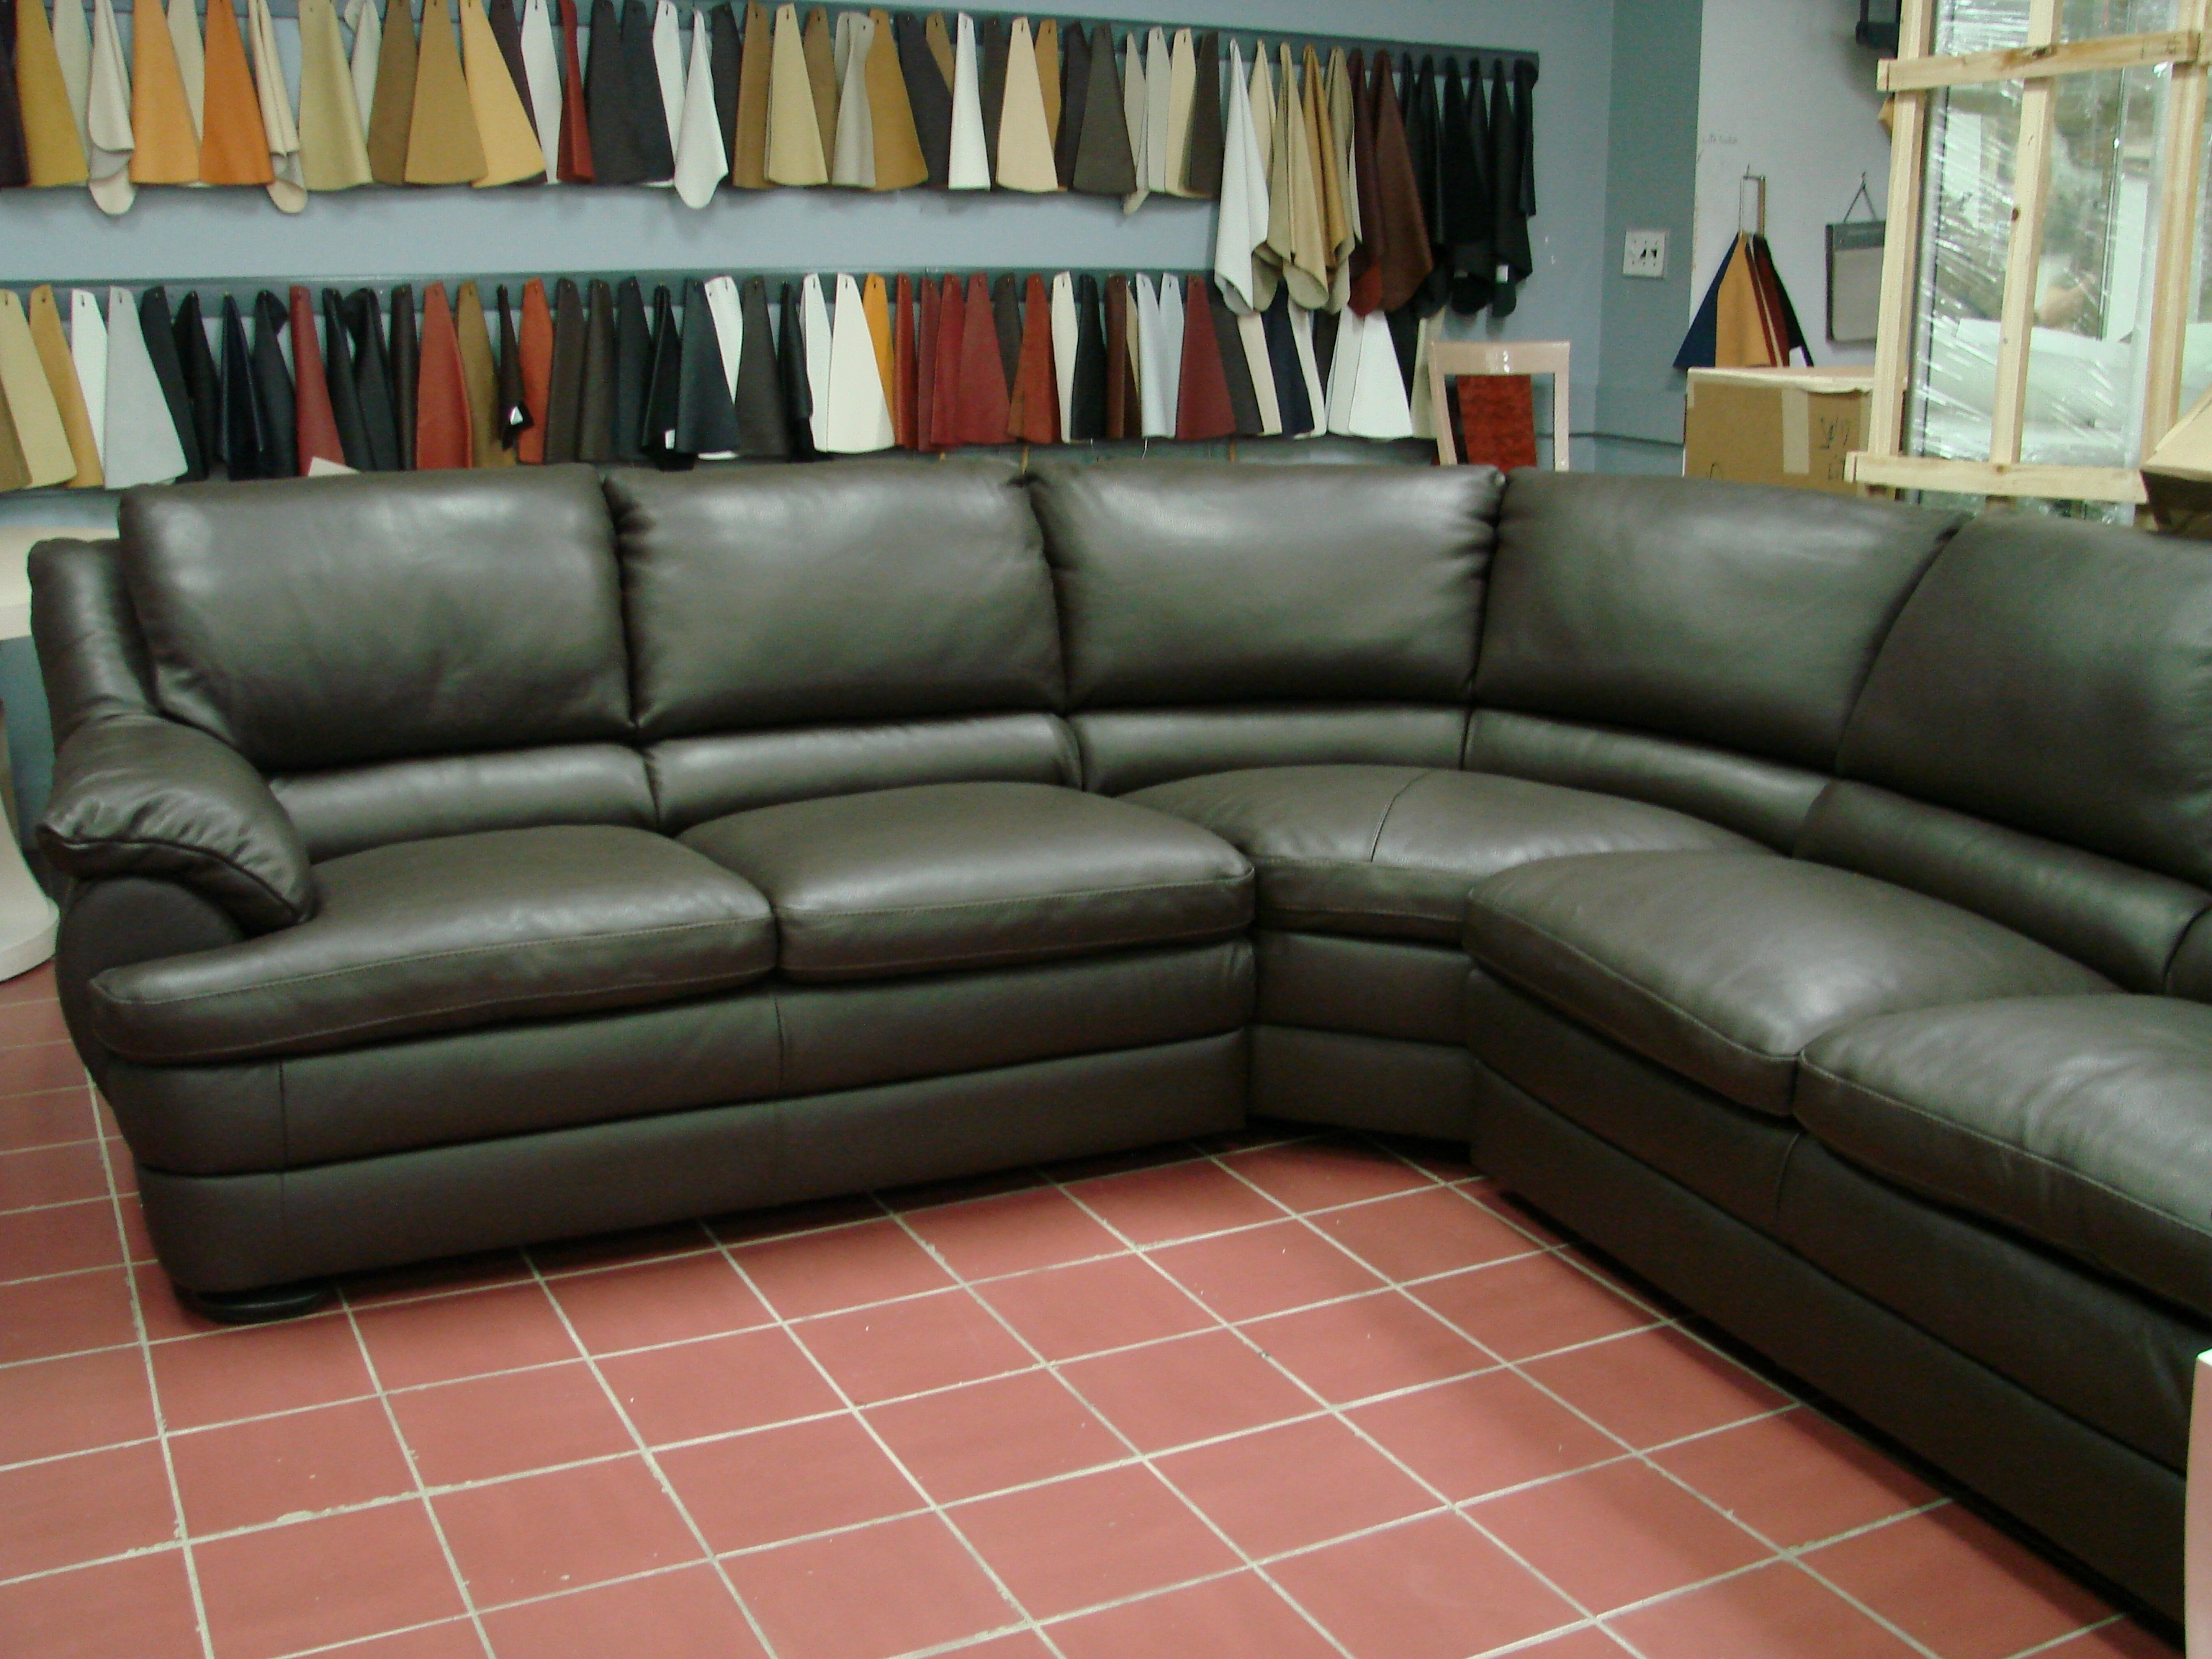 Leather Sectional Sofas Ottawa wwwcintronbeveragegroupcom